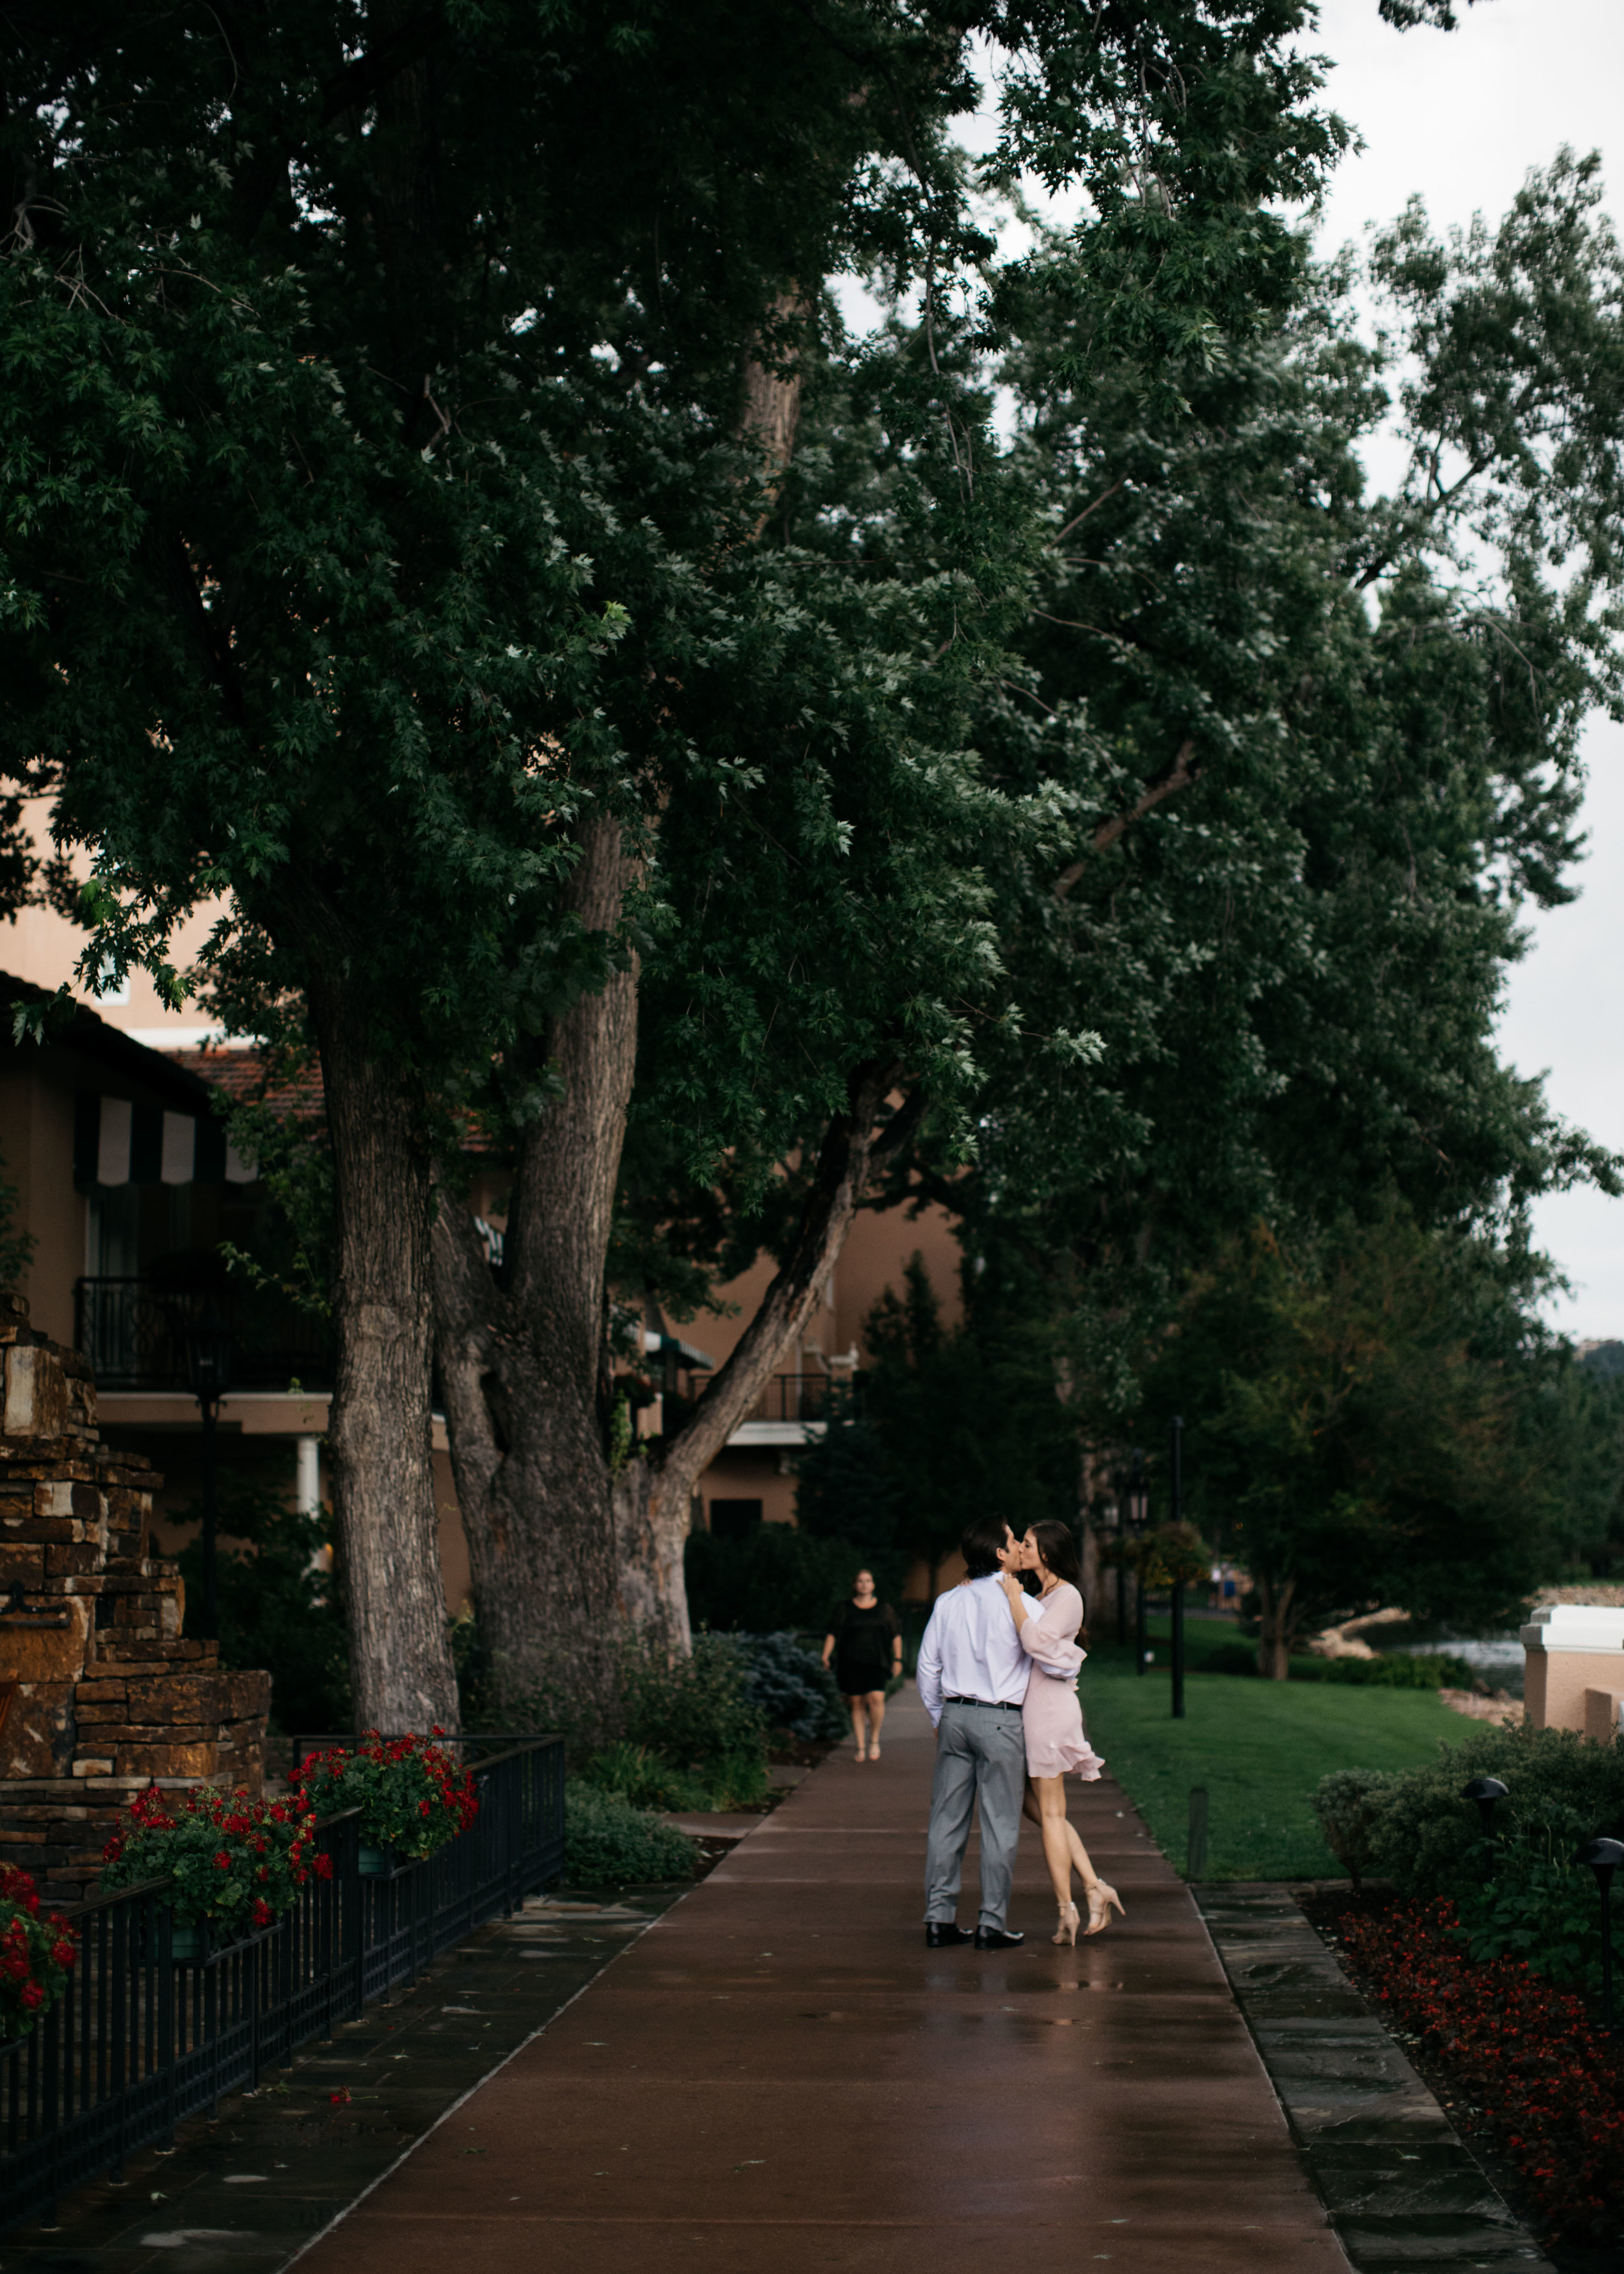 broadmoor-engagement-photography-43.jpg